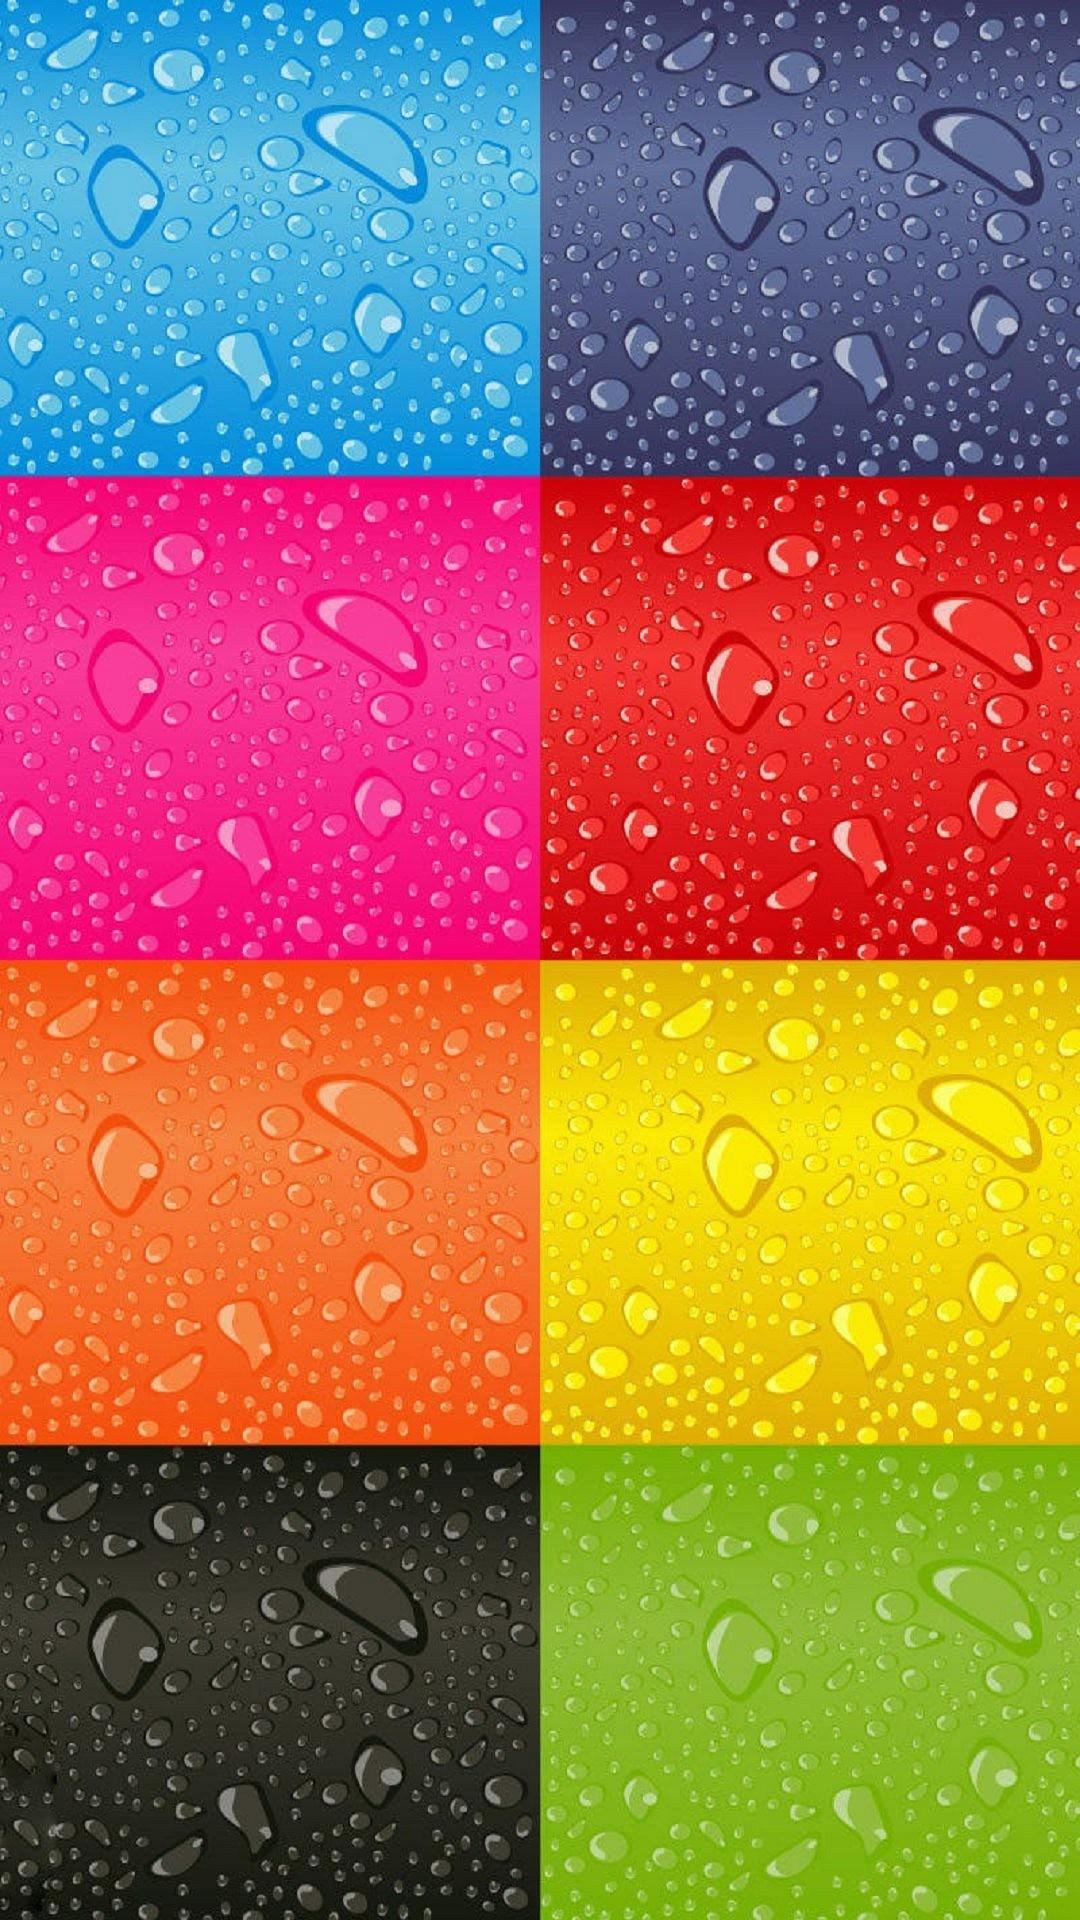 Z wallpaper full hd 1080 x 1920 smartphone screen division colorful